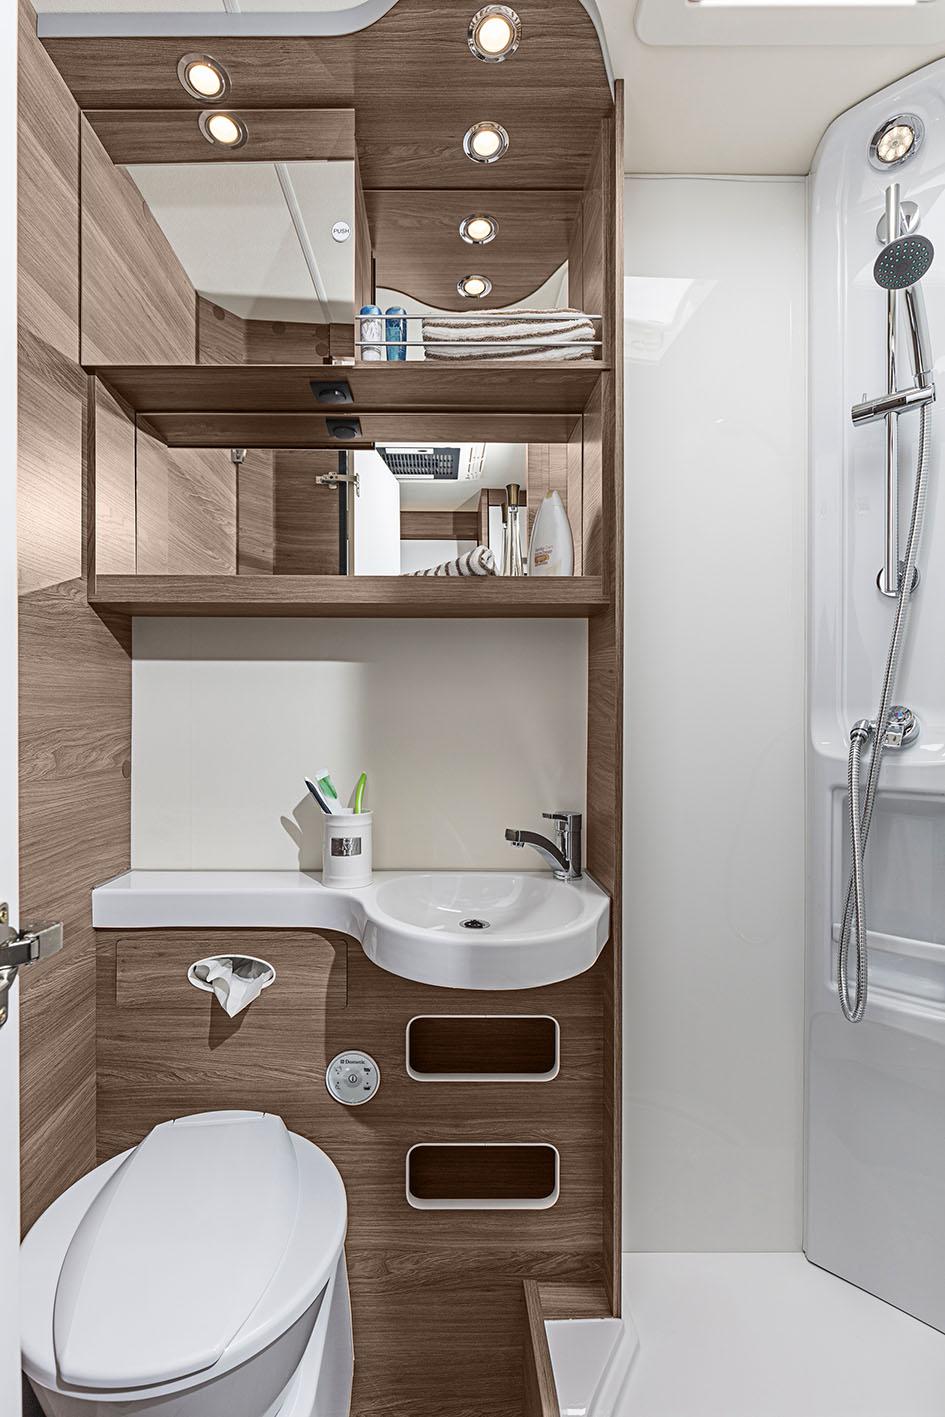 knaus wohnmobil mieten teilintegriert oder alkoven in g ttingen. Black Bedroom Furniture Sets. Home Design Ideas